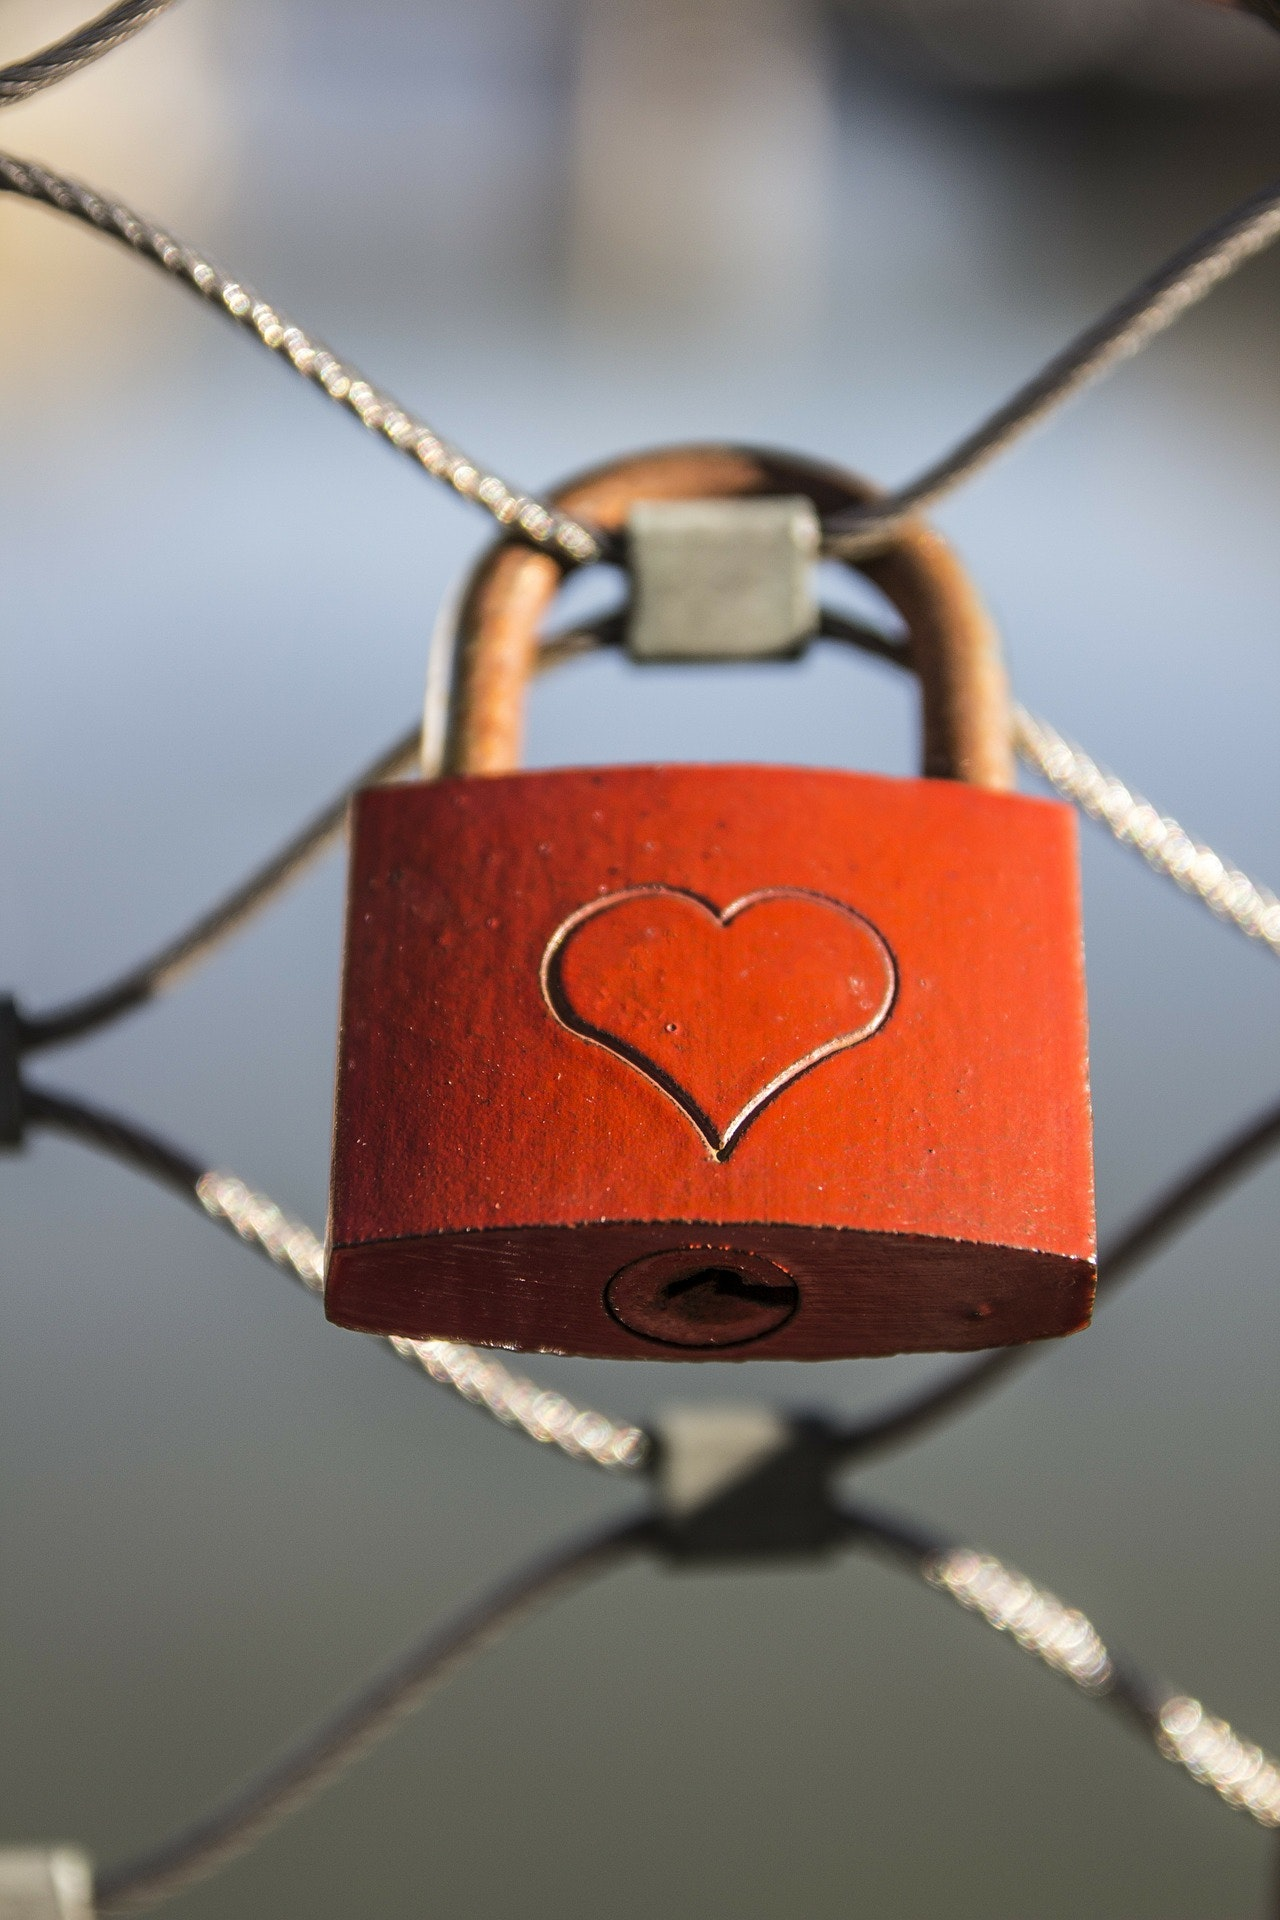 Big red heart on dark background · Free Stock Photo